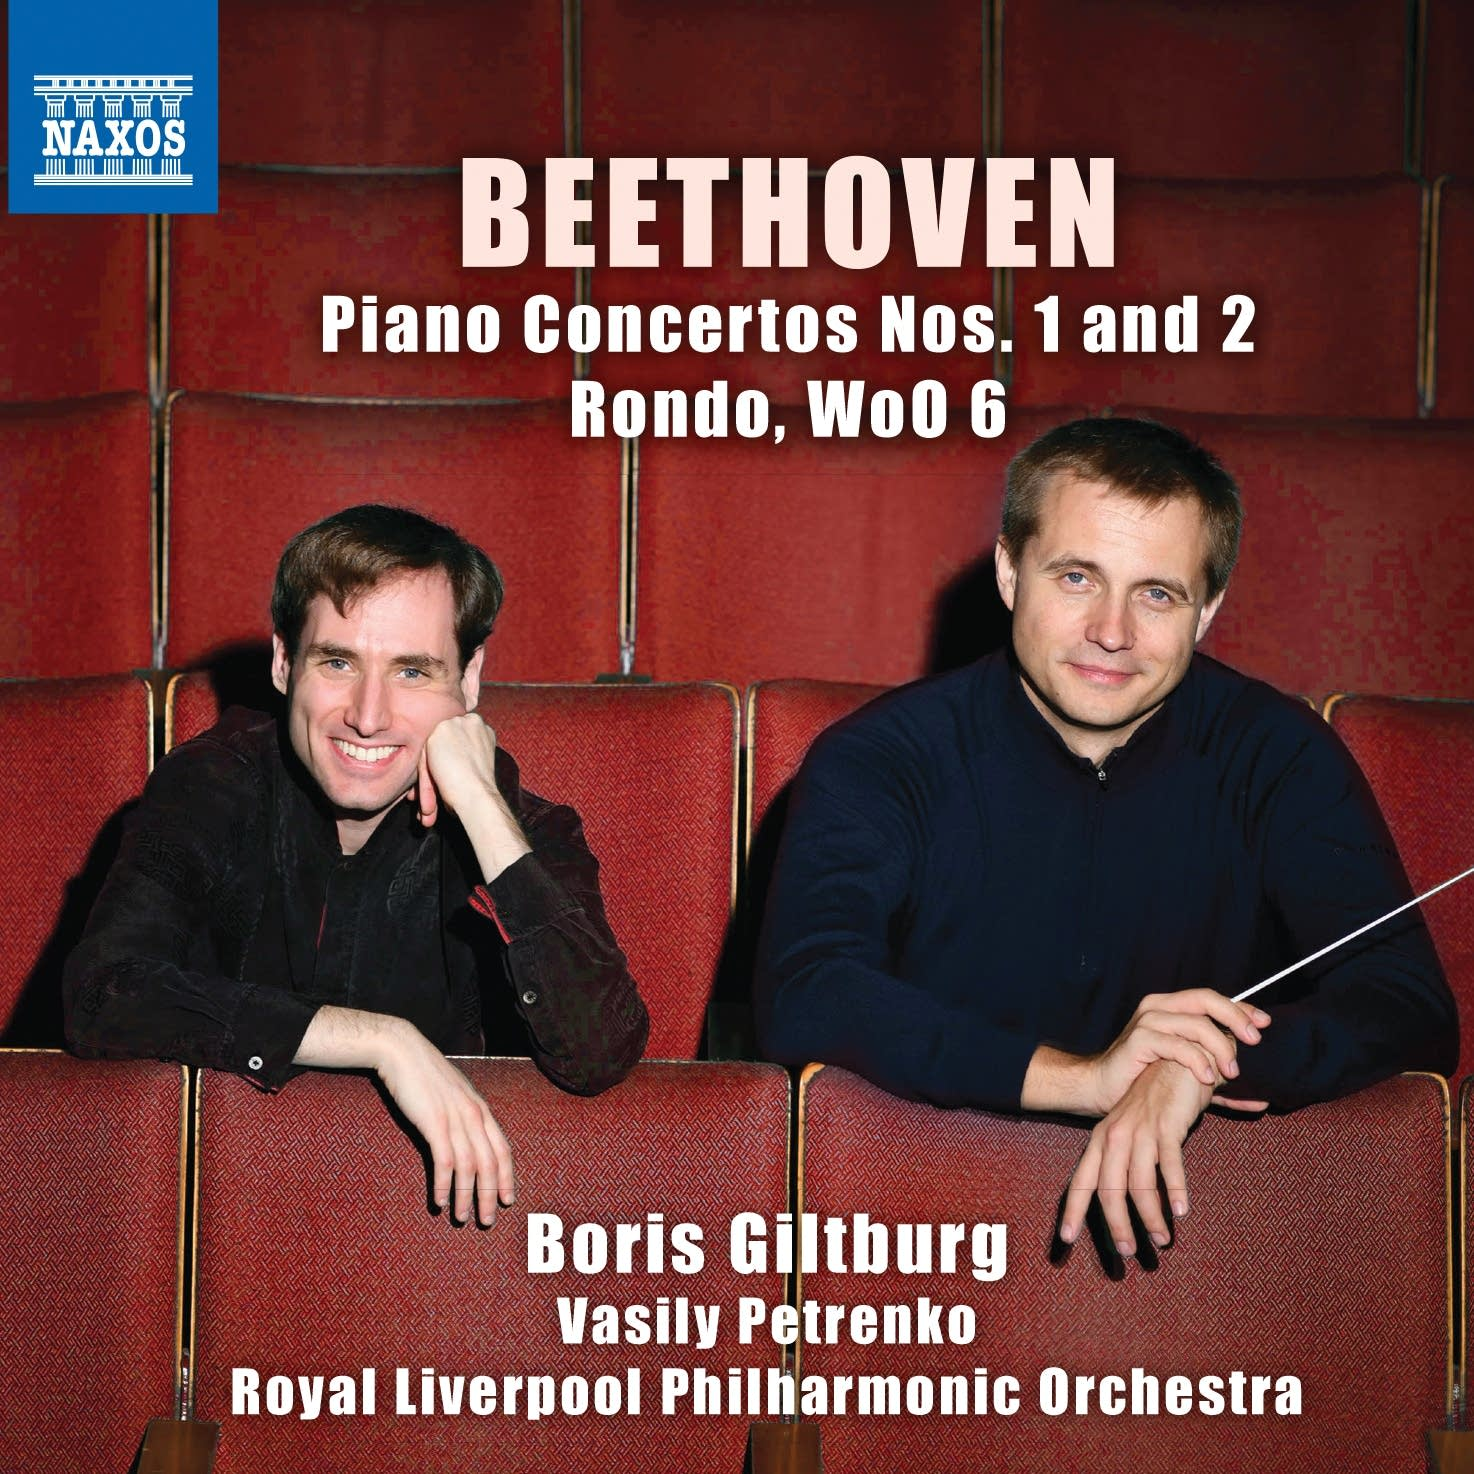 Ludwig van Beethoven - Piano Concerto No. 2: III. Rondo